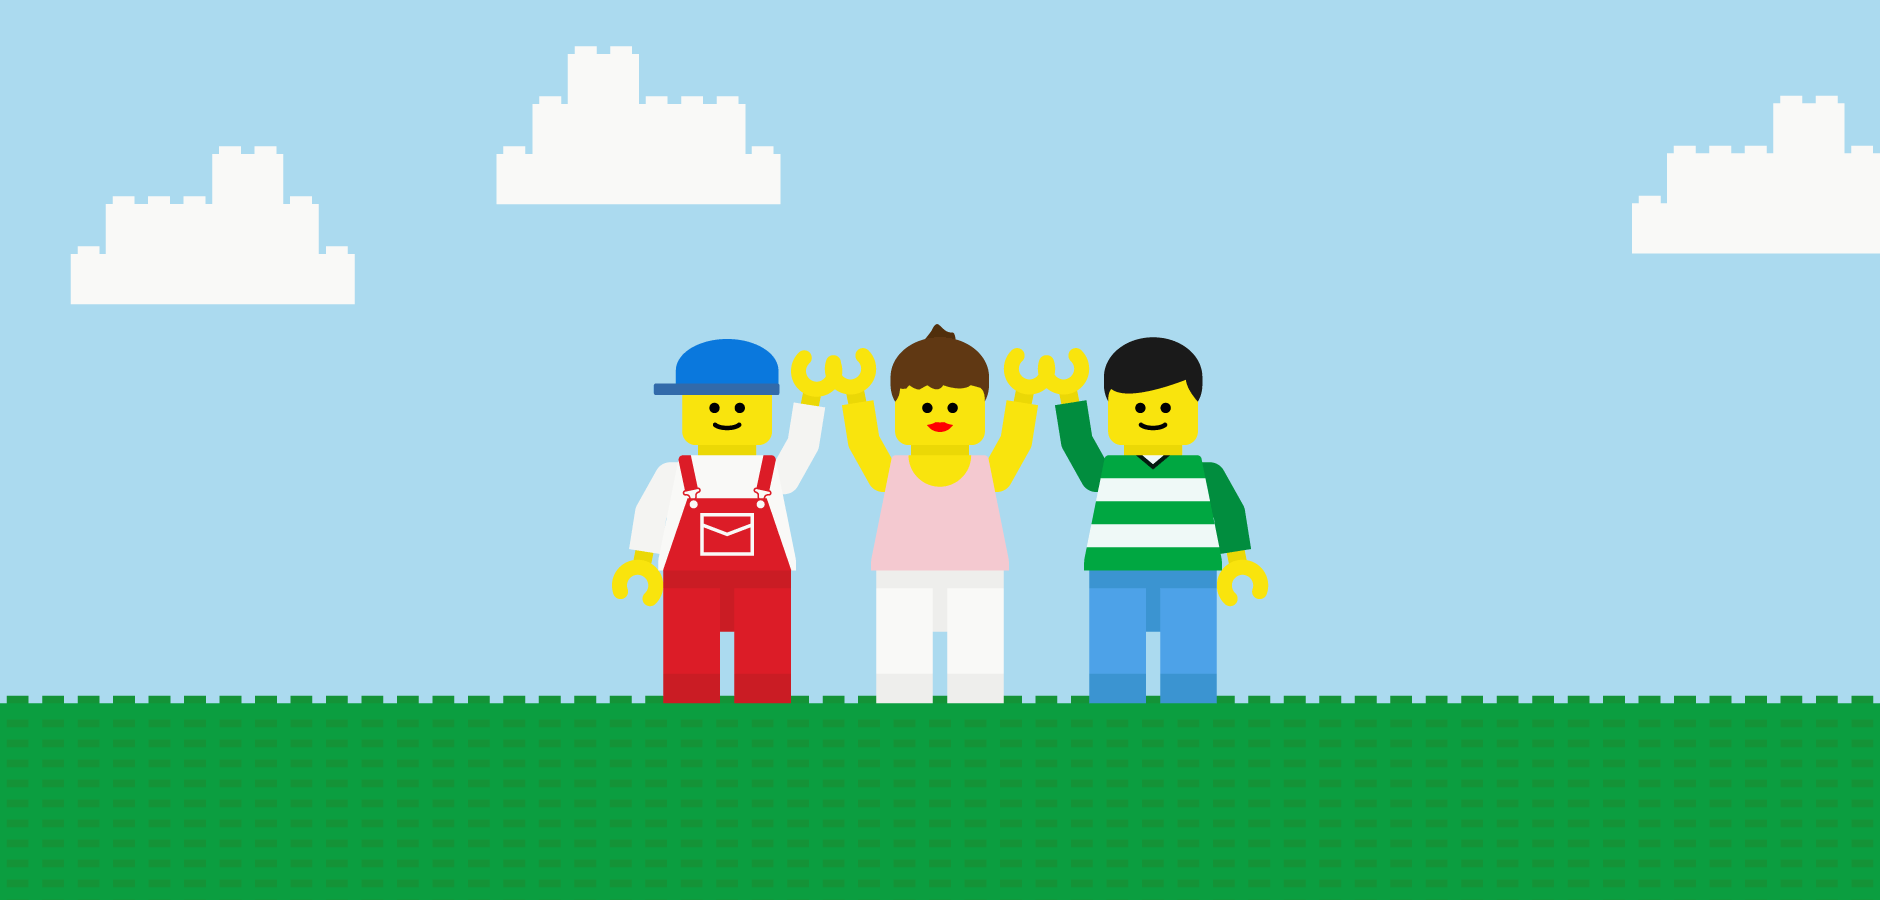 Dot Pixel - Illustration - Lego Pals